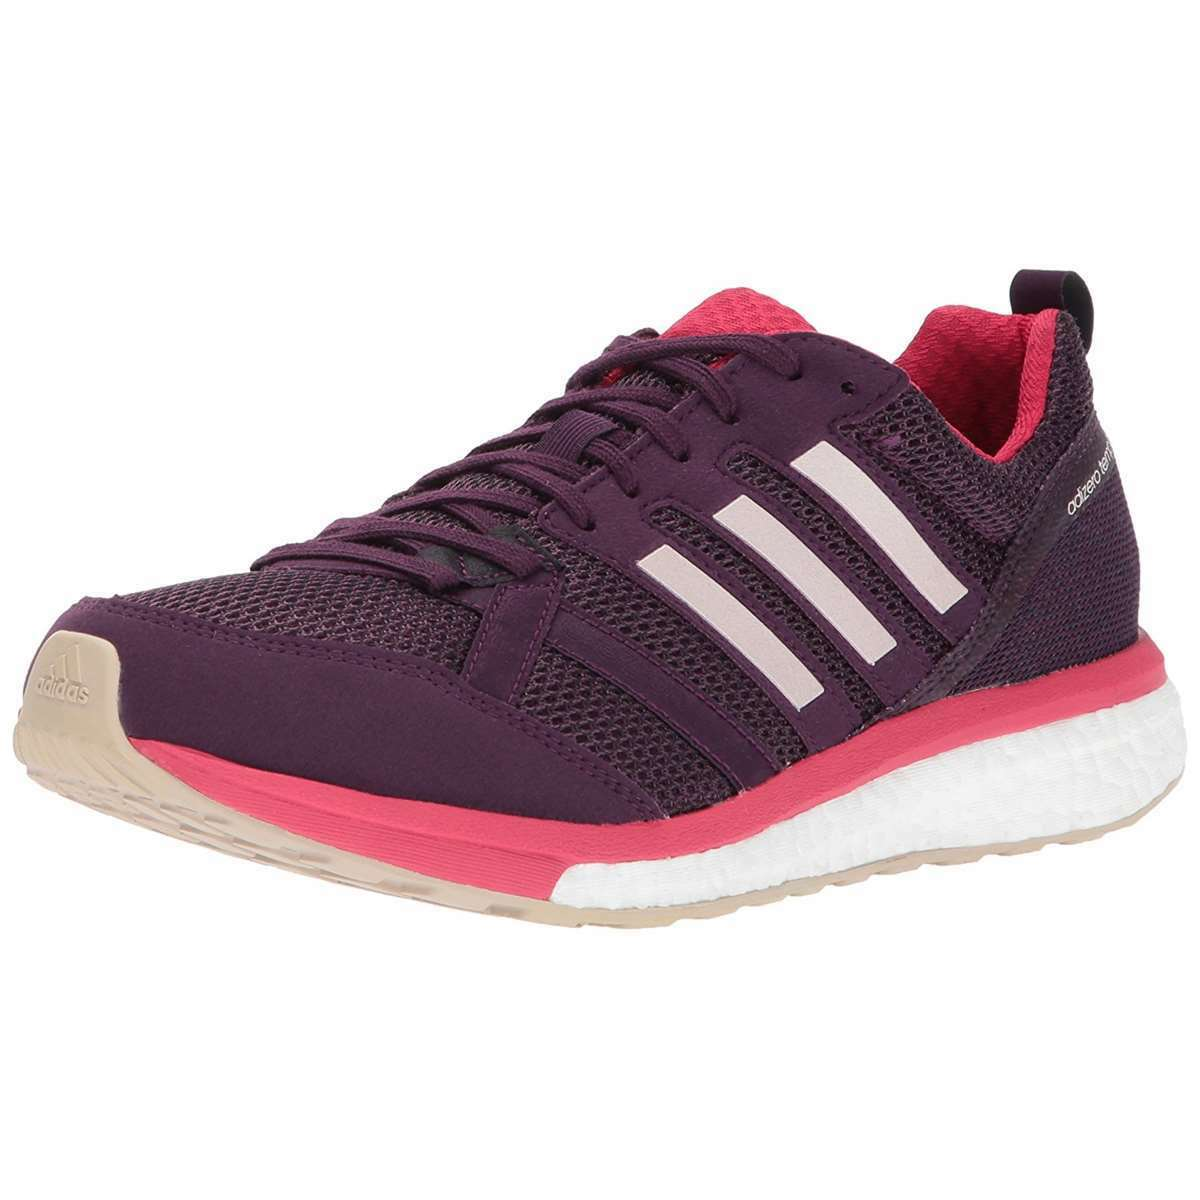 Adidas Donna ADIZERO Tempo  9 Running Training Shoes  Tempo NEW c3cc63